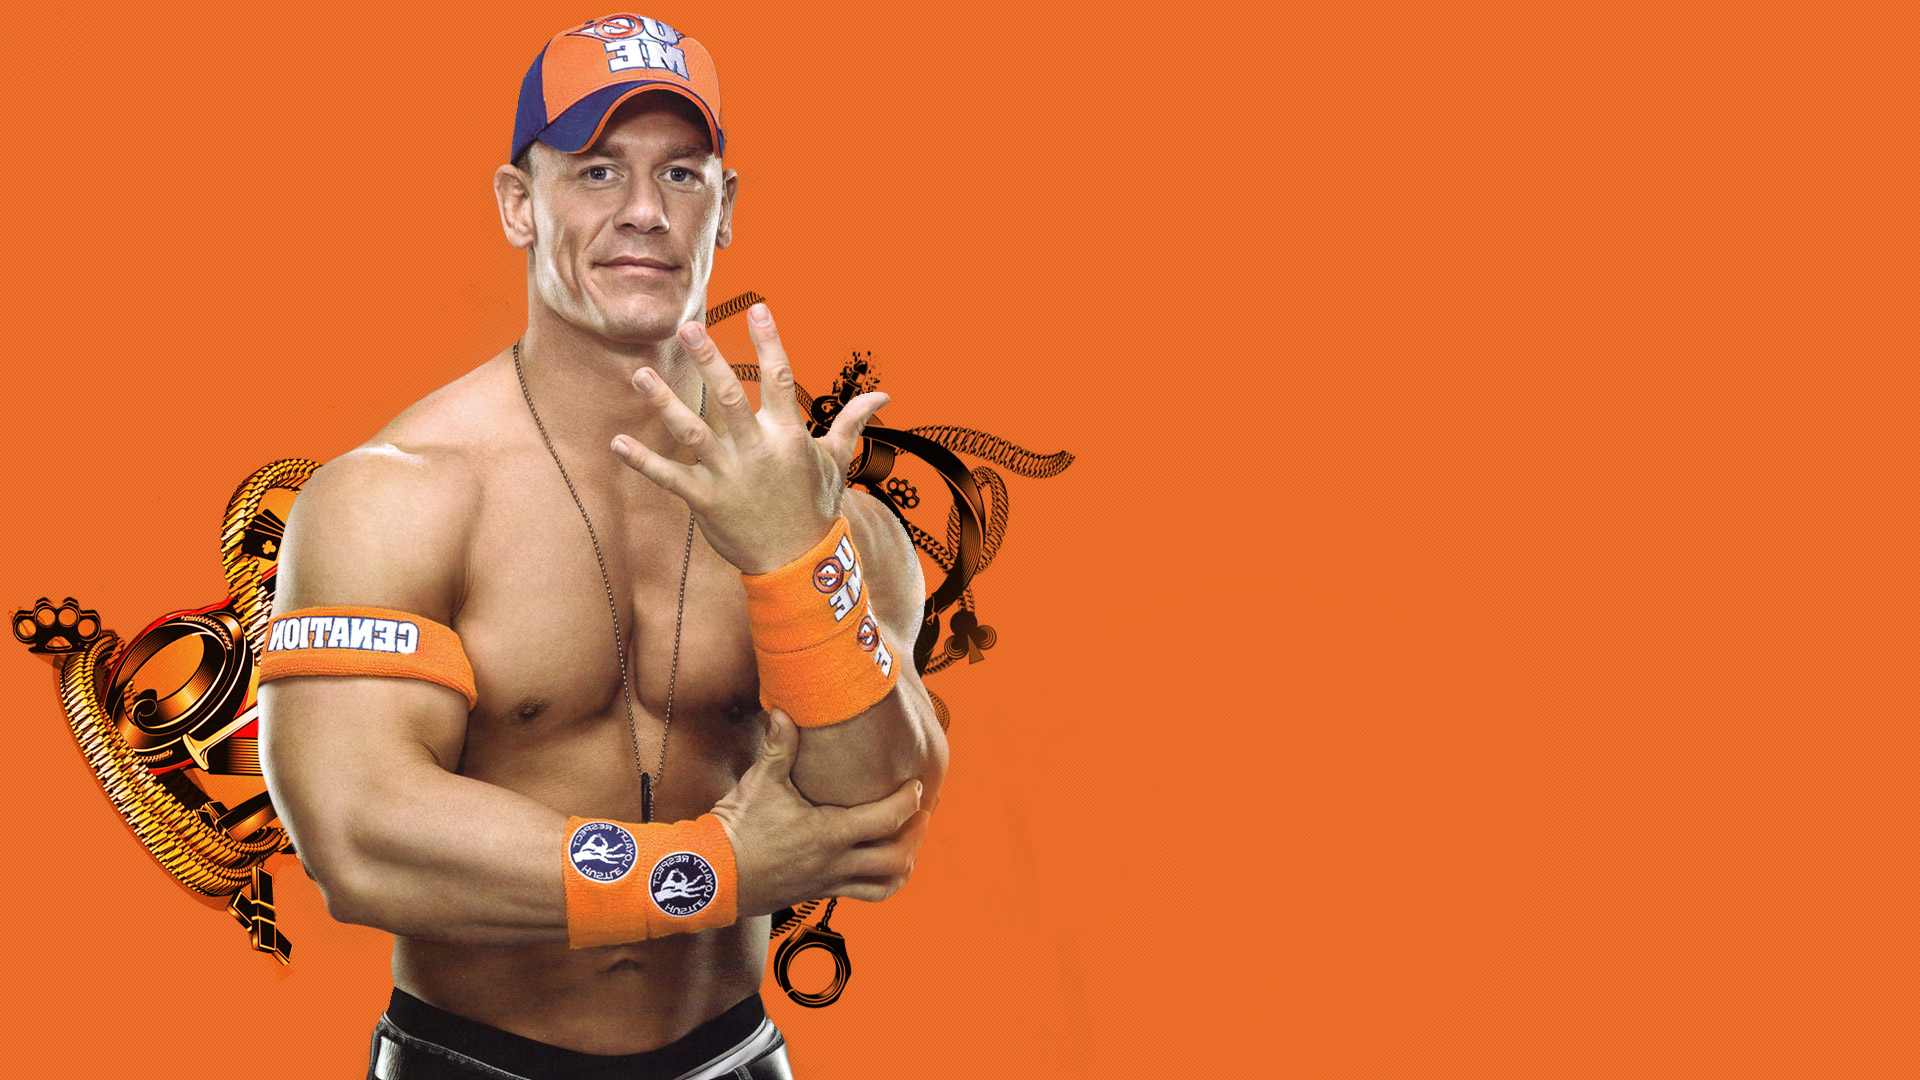 Amazing Wallpaper Logo John Cena - johncena39  Snapshot_392711.jpg